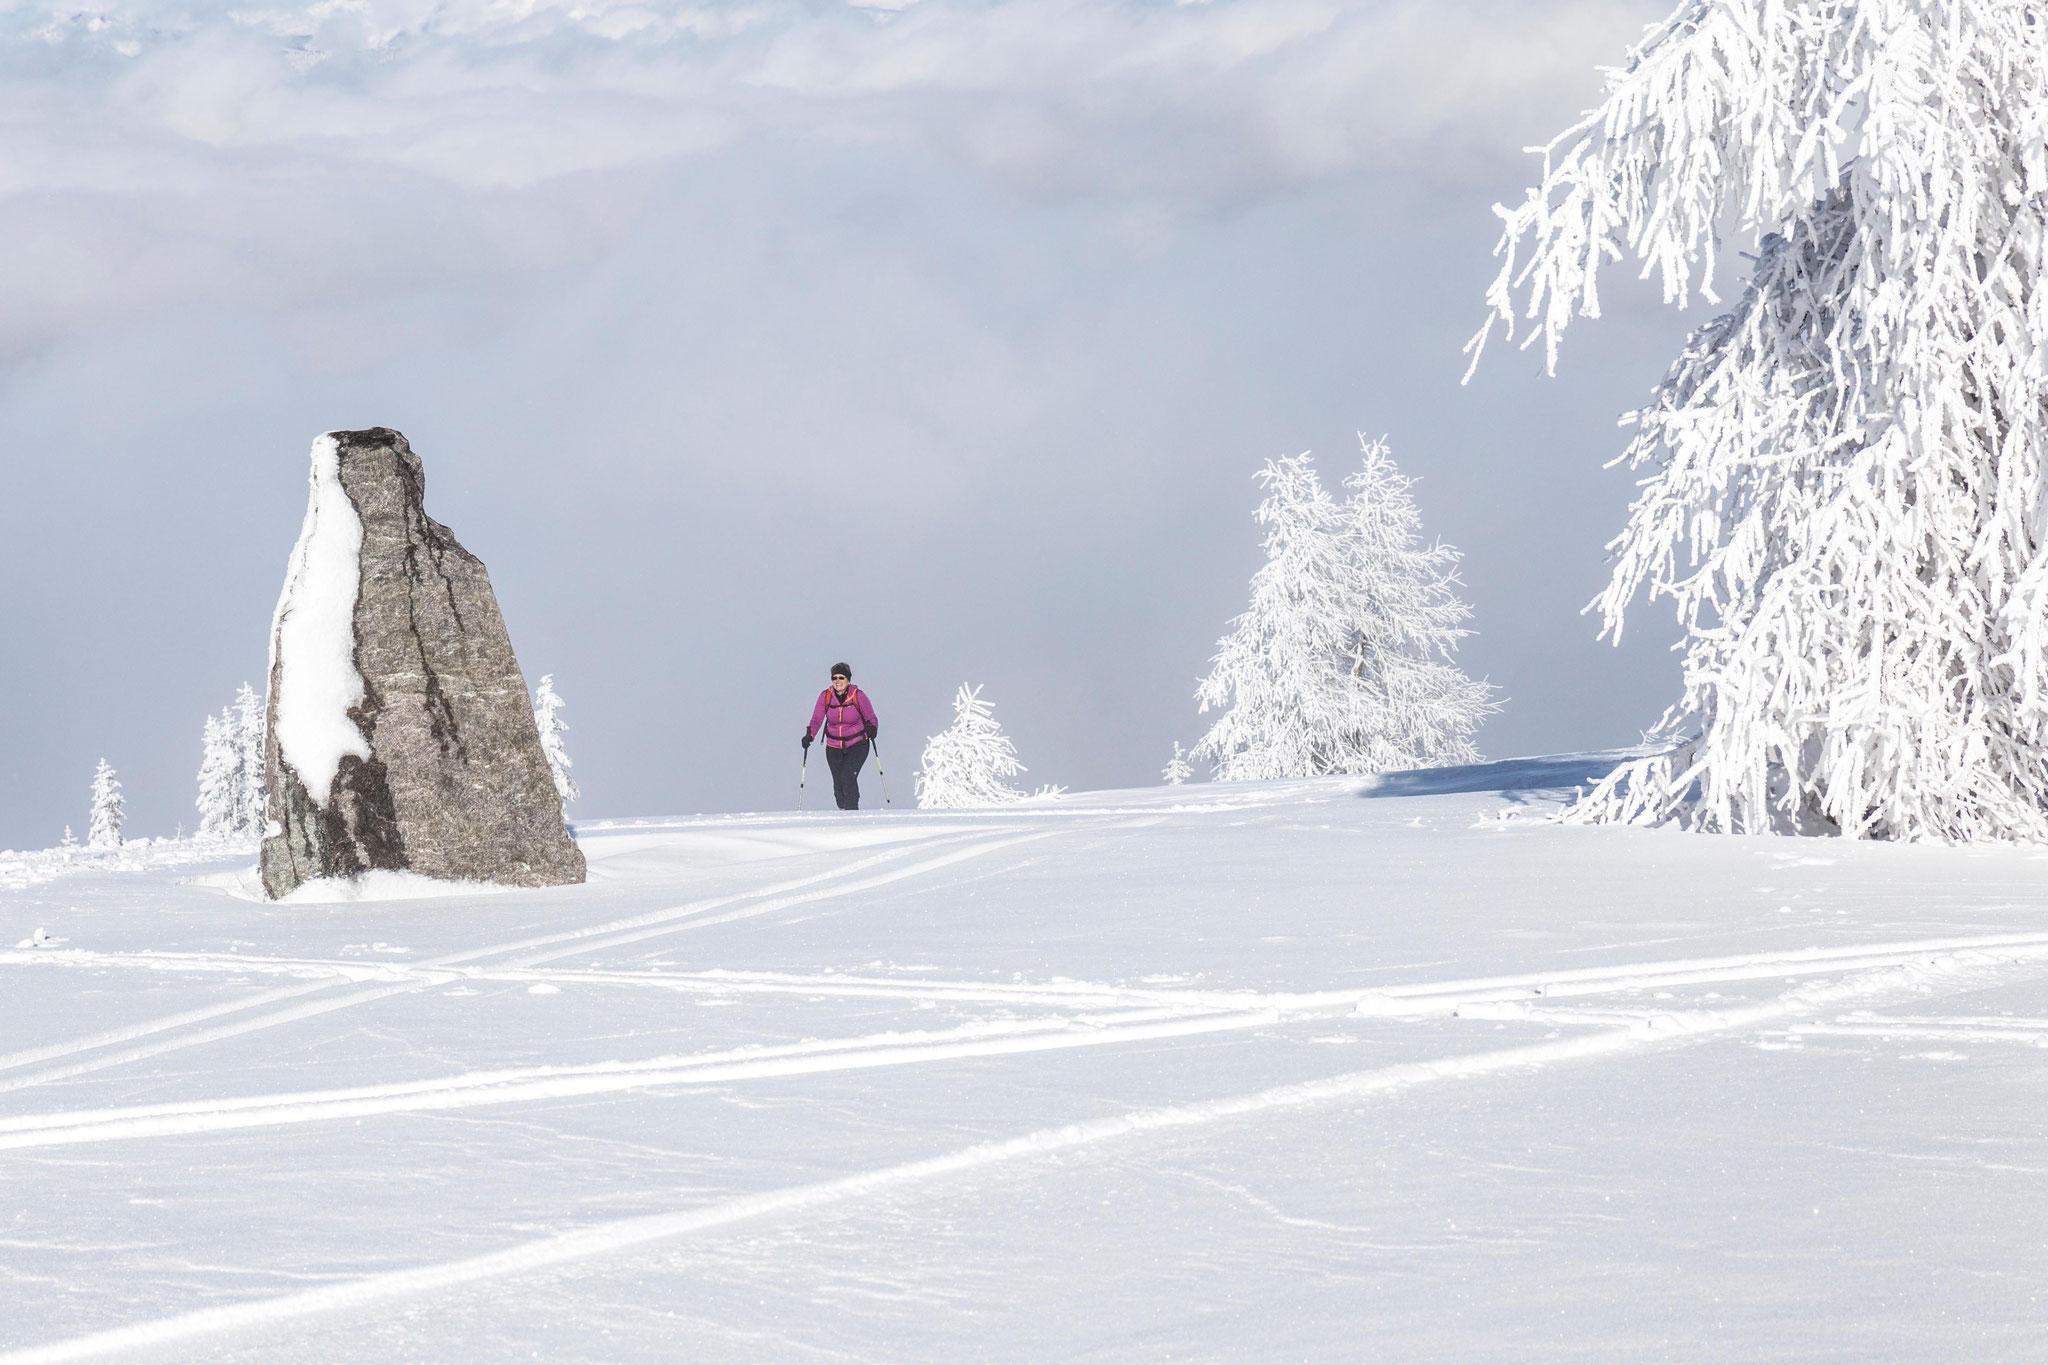 Winterwandern in der Umgebung